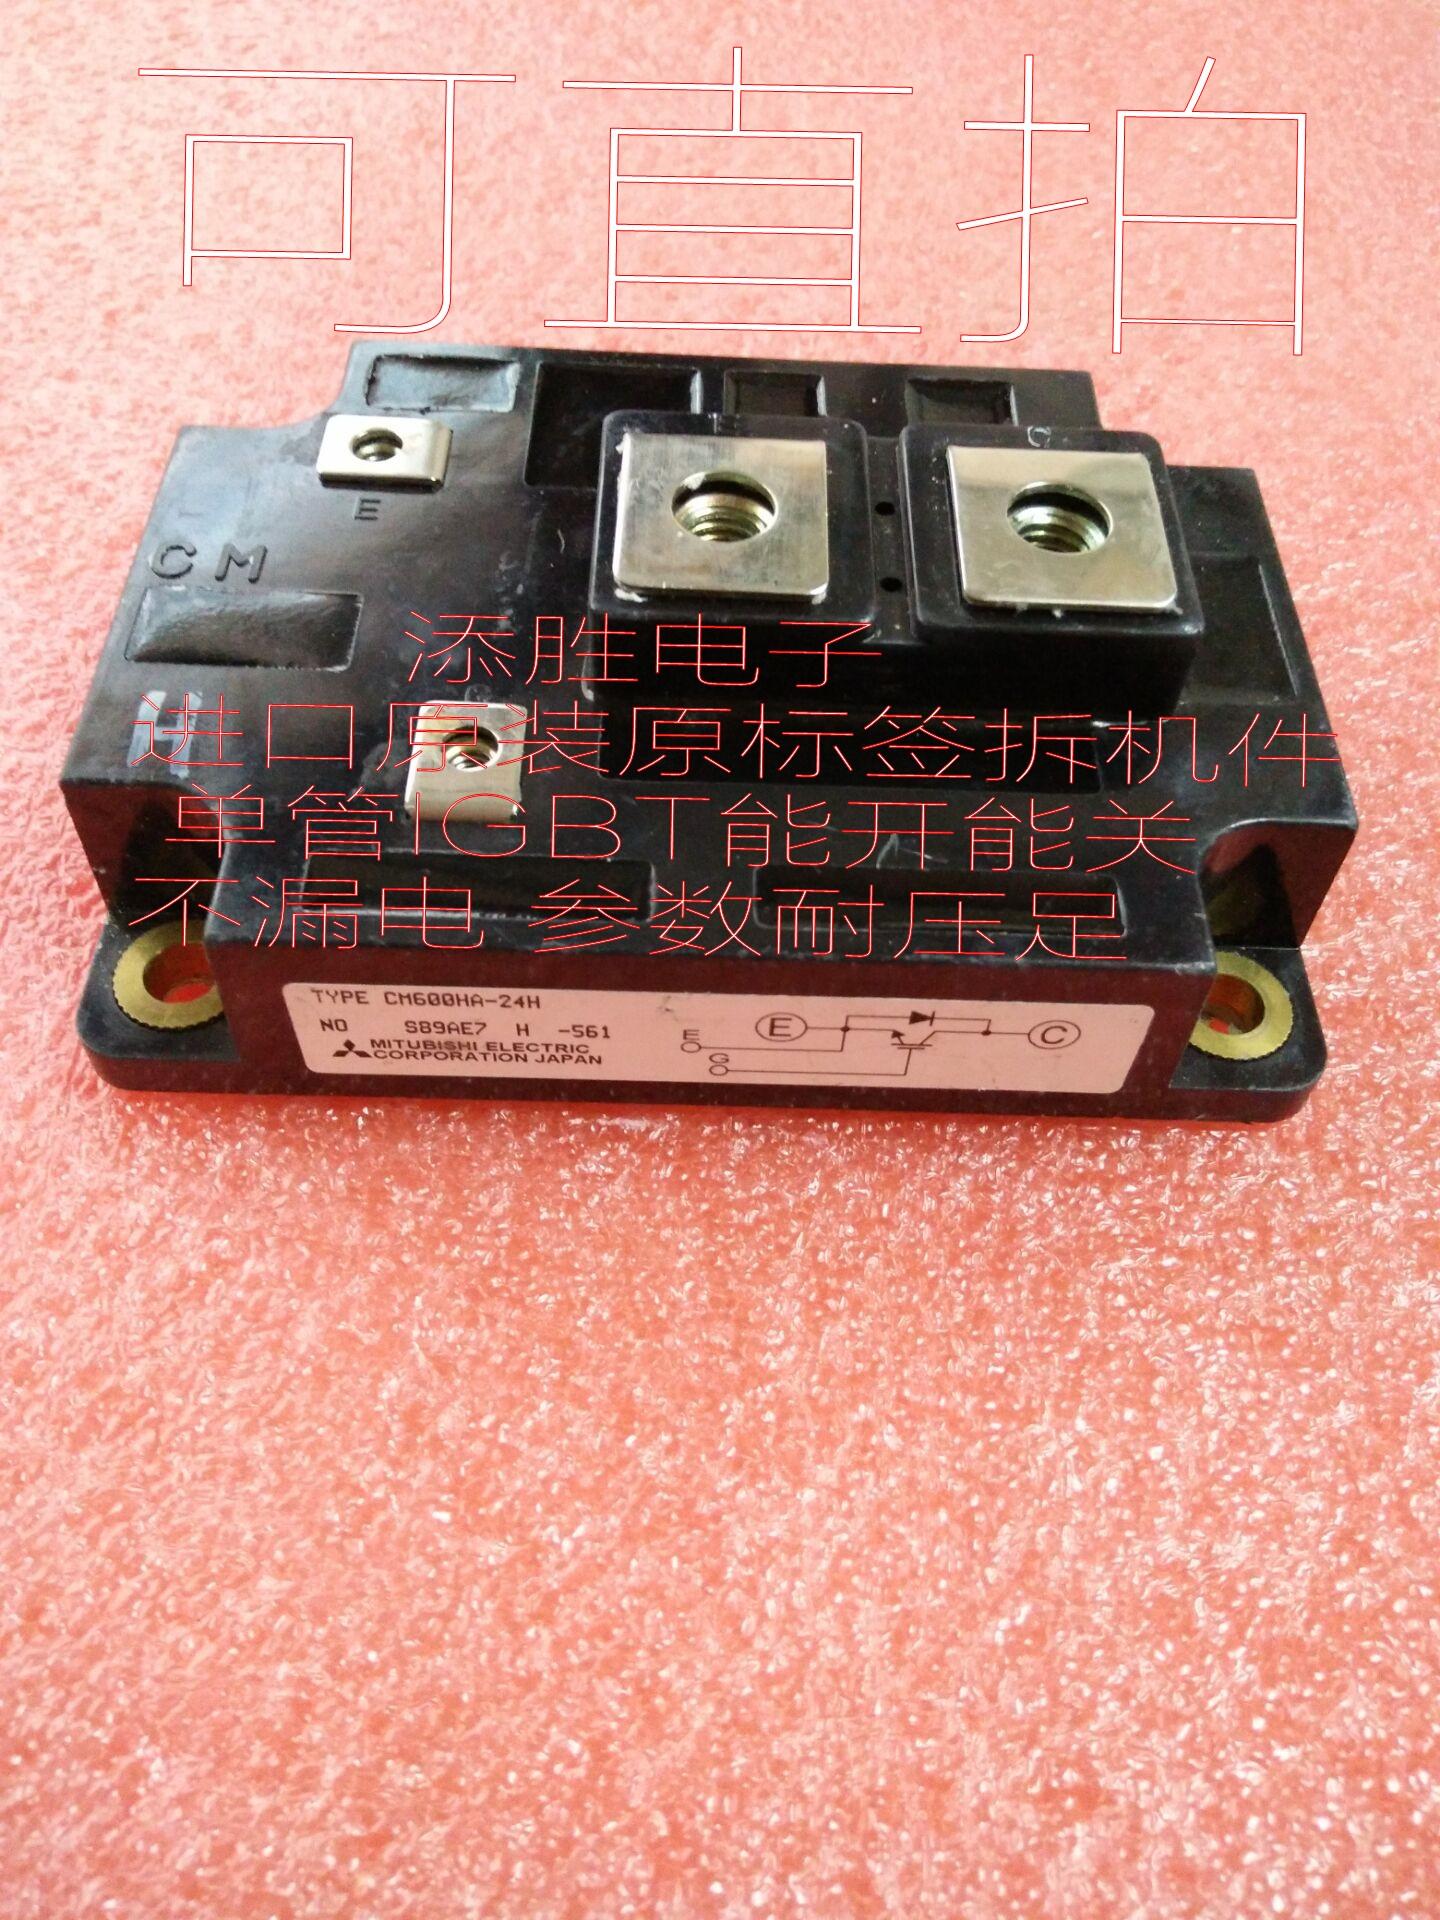 CM600HA-24H single-tube IGBT600A1200V IGBT module 600A CM600HA-24H